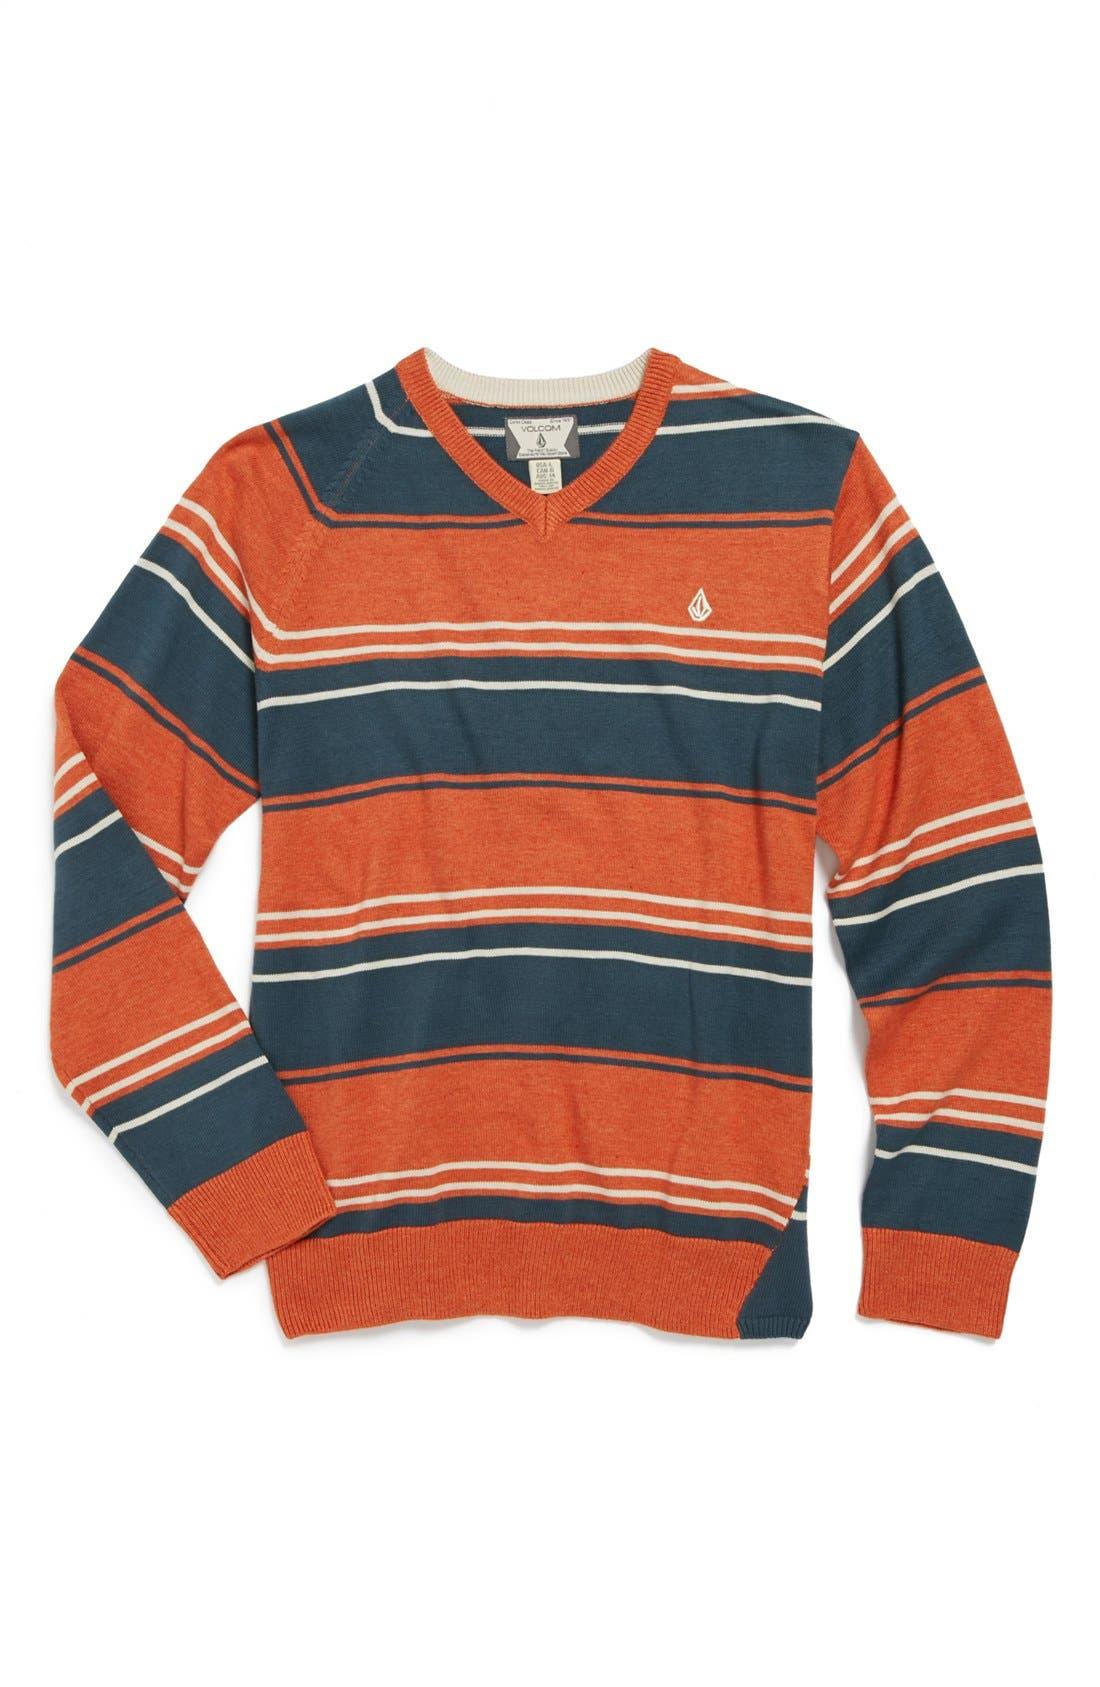 Main Image - Volcom 'Understated' Stripe V-Neck Sweater (Big Boys)